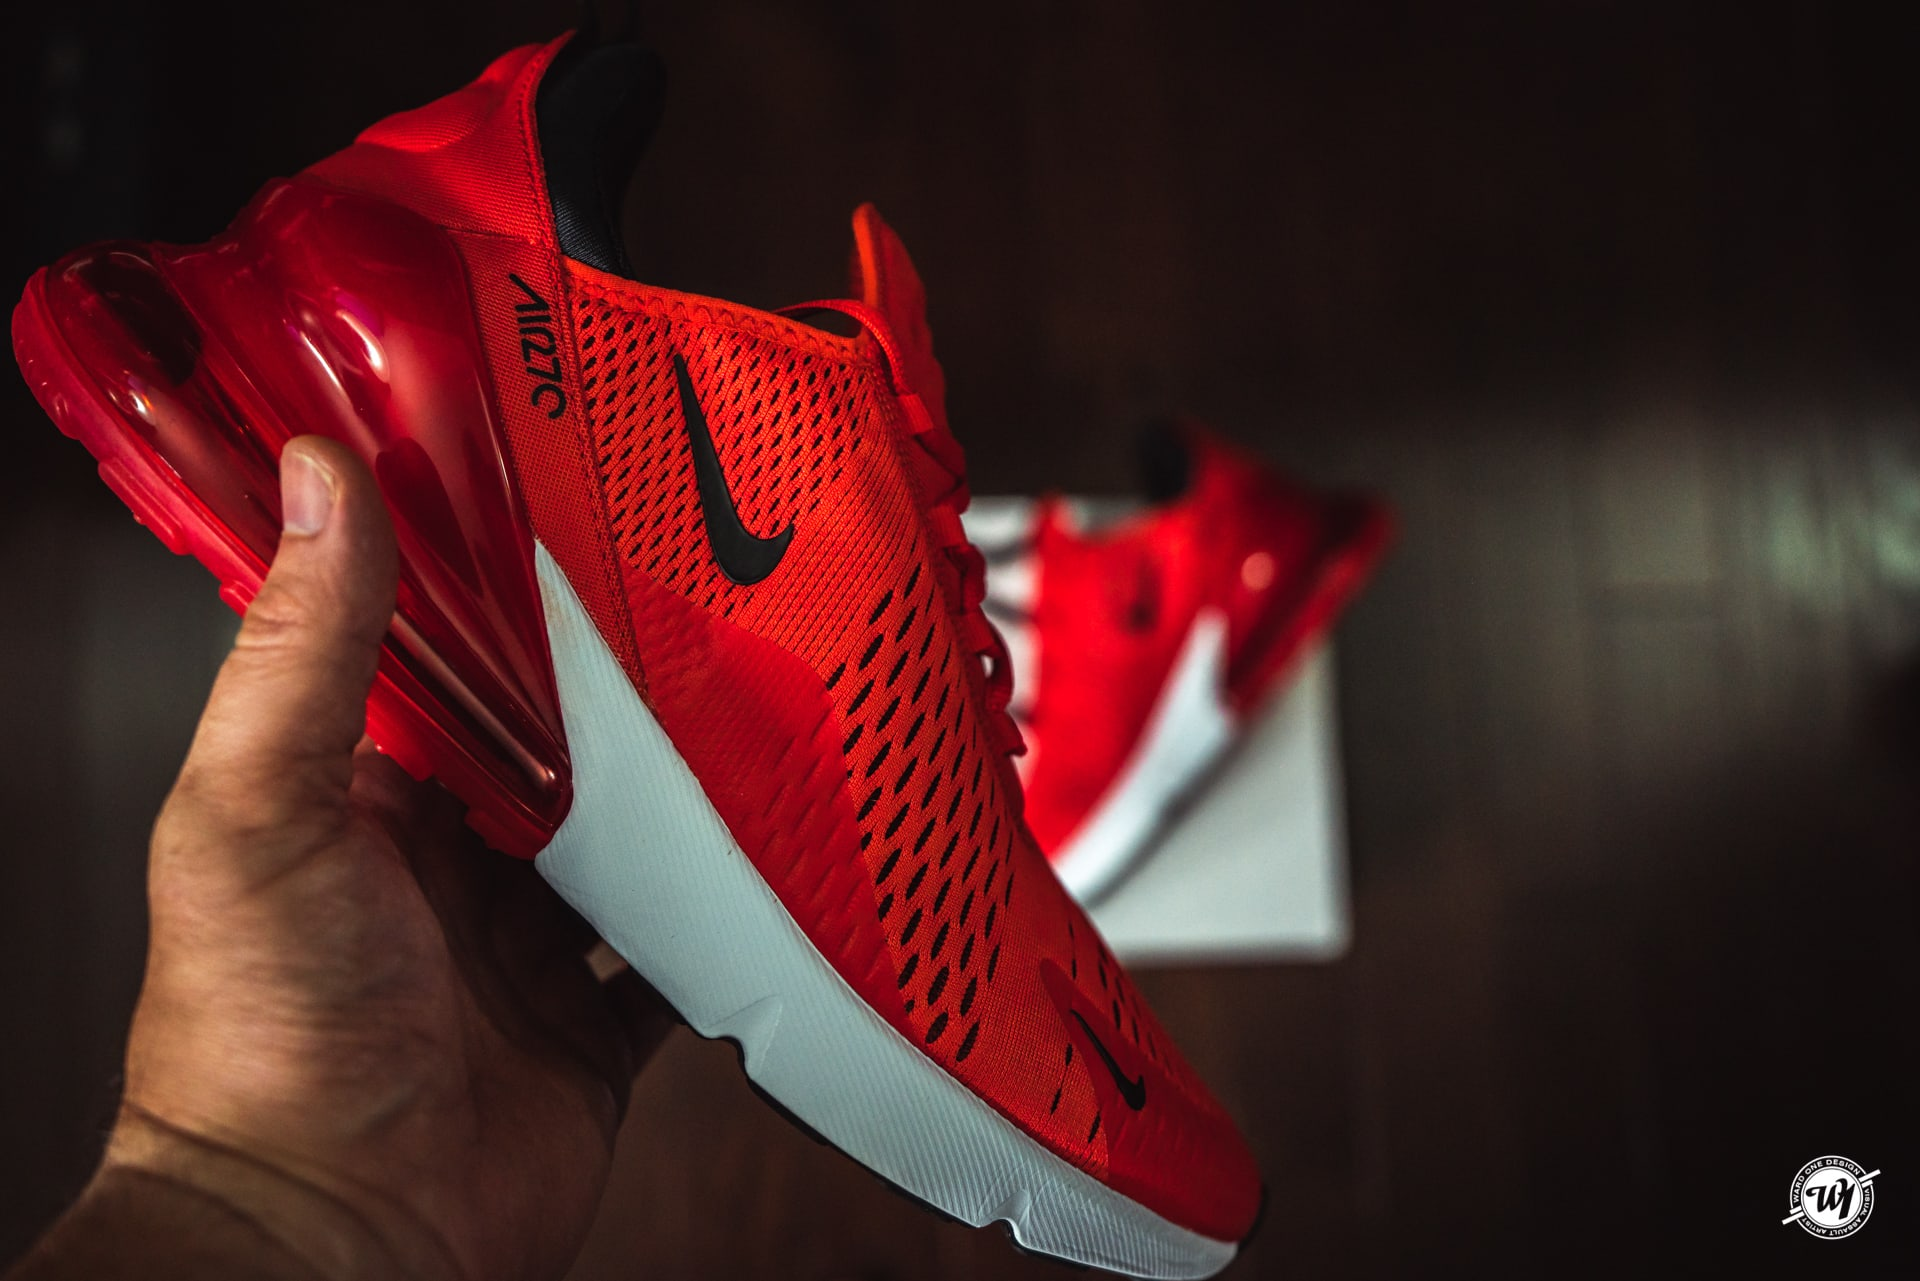 innovative design 85d67 c57a6 Nike Air Max 270 • Habanero Red   Ward 1 Design